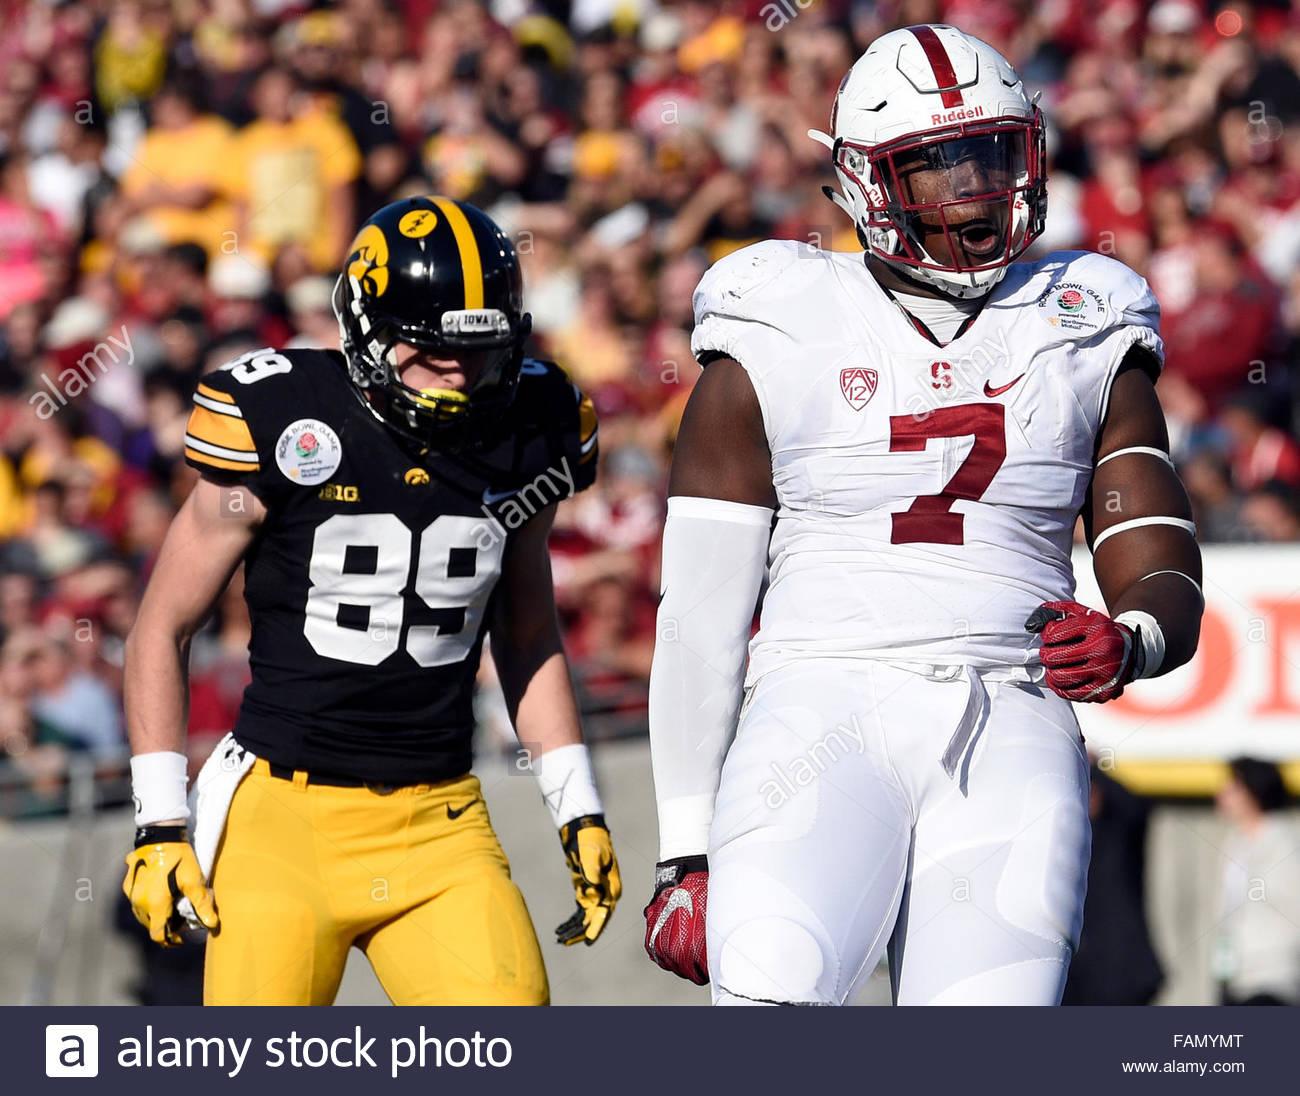 Pasadena, California, USA. 01st Jan, 2016. Stanford defensive end Aziz Shittu (7) reacts after a tackle again Iowa - Stock Image